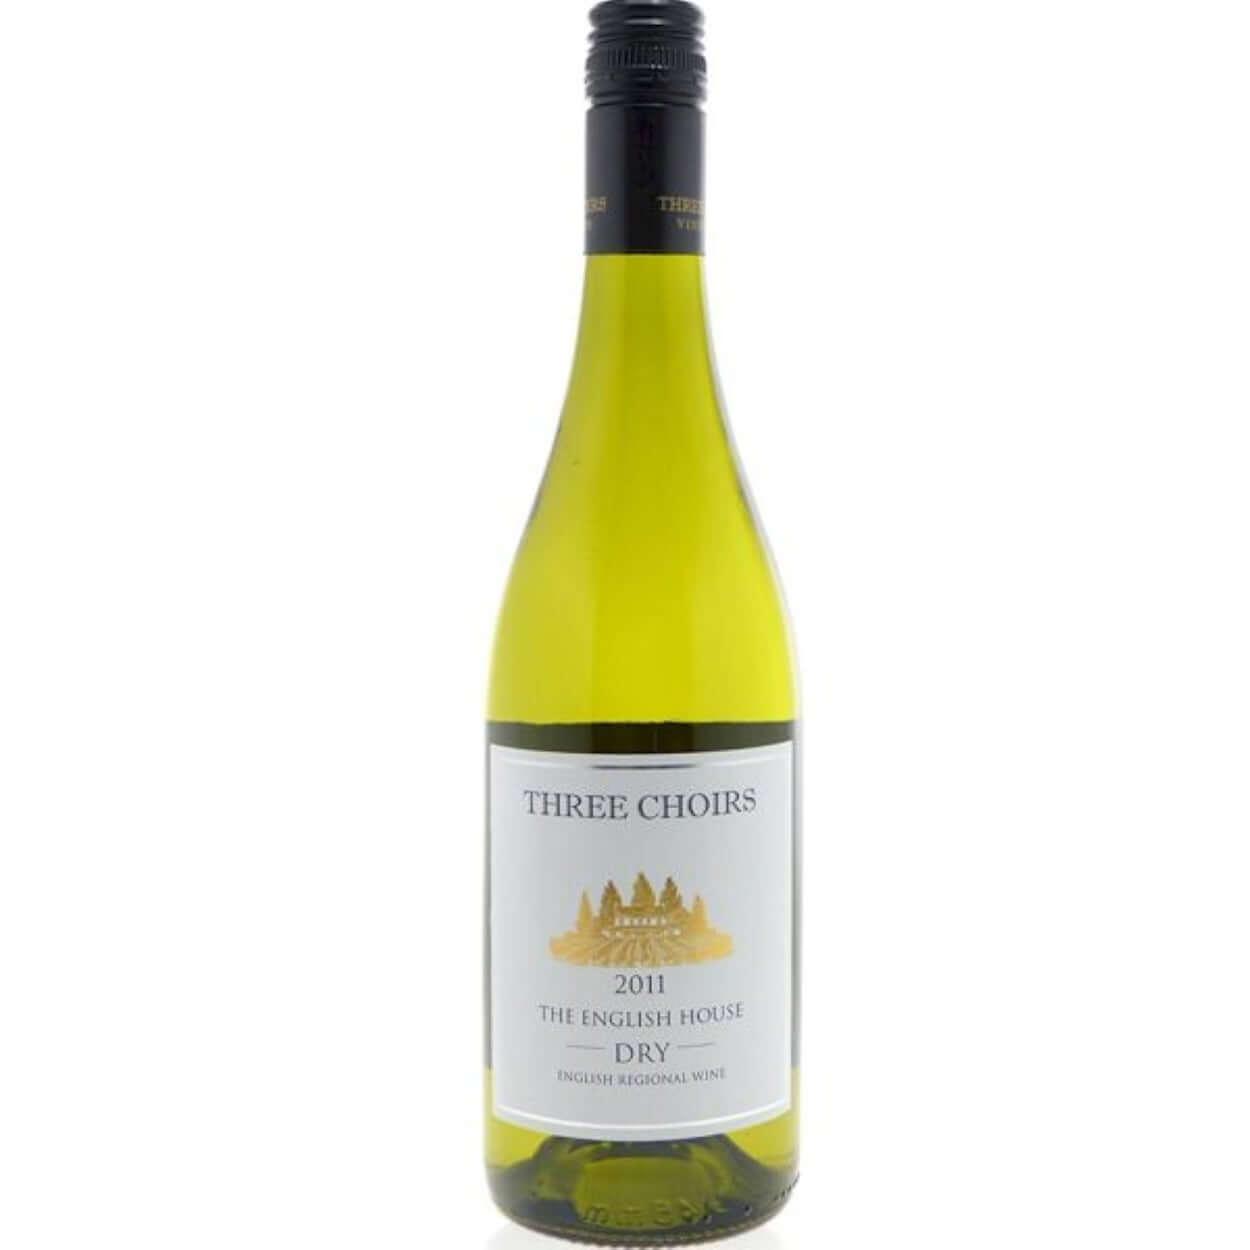 Three Choirs English House Dry 2017 English White Wine